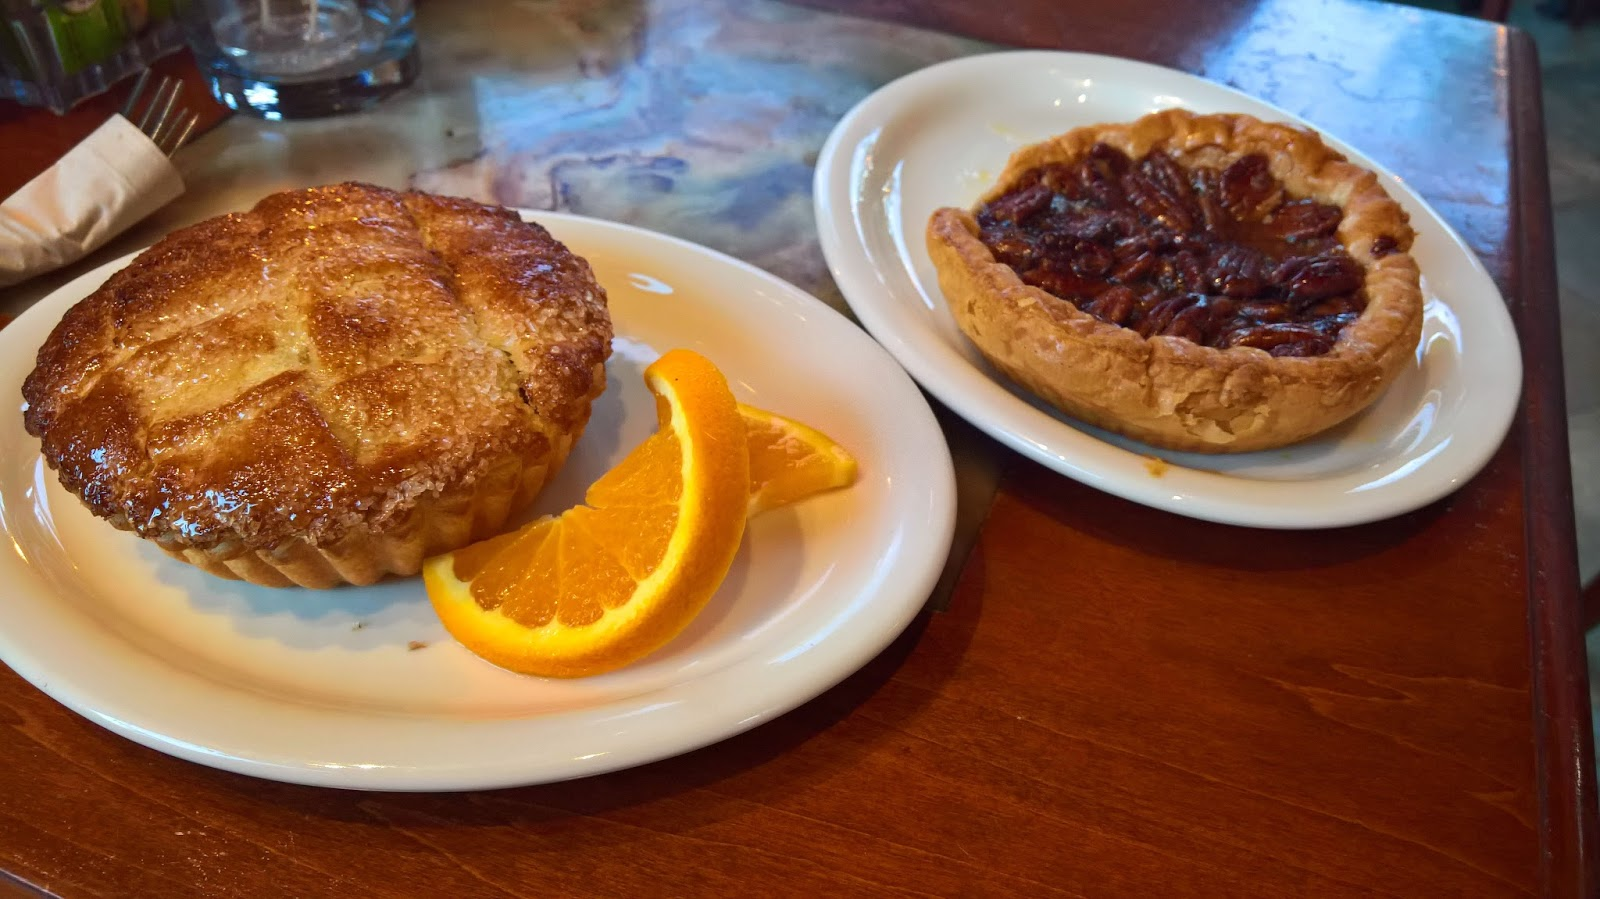 Santa Monica Los Angeles Urth Caffe kahvila vinkki Mallaspulla matkakertomus omenapiirakka pekaanipähkinäpiirakka